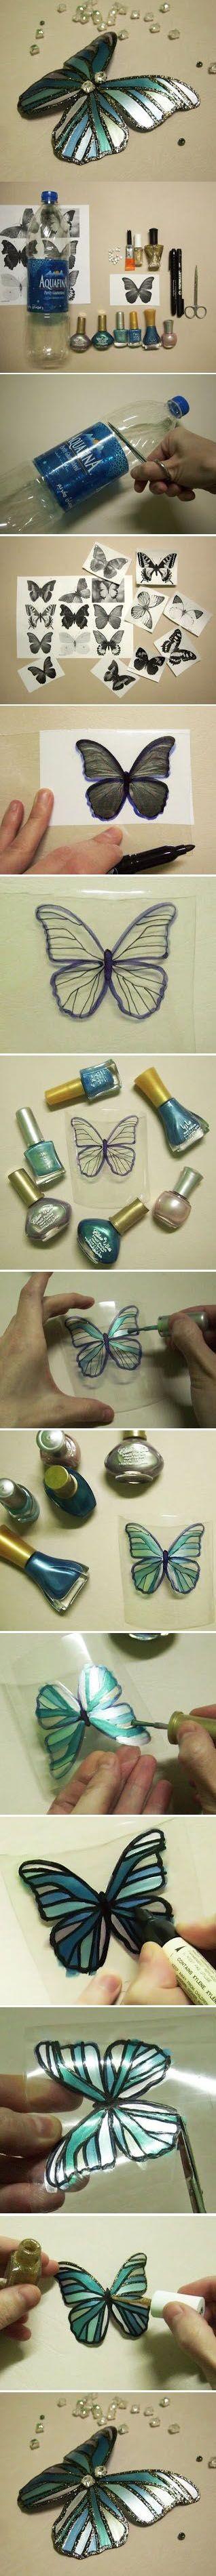 Diy Beautiful Butterfly | DIY & Crafts Tutorials